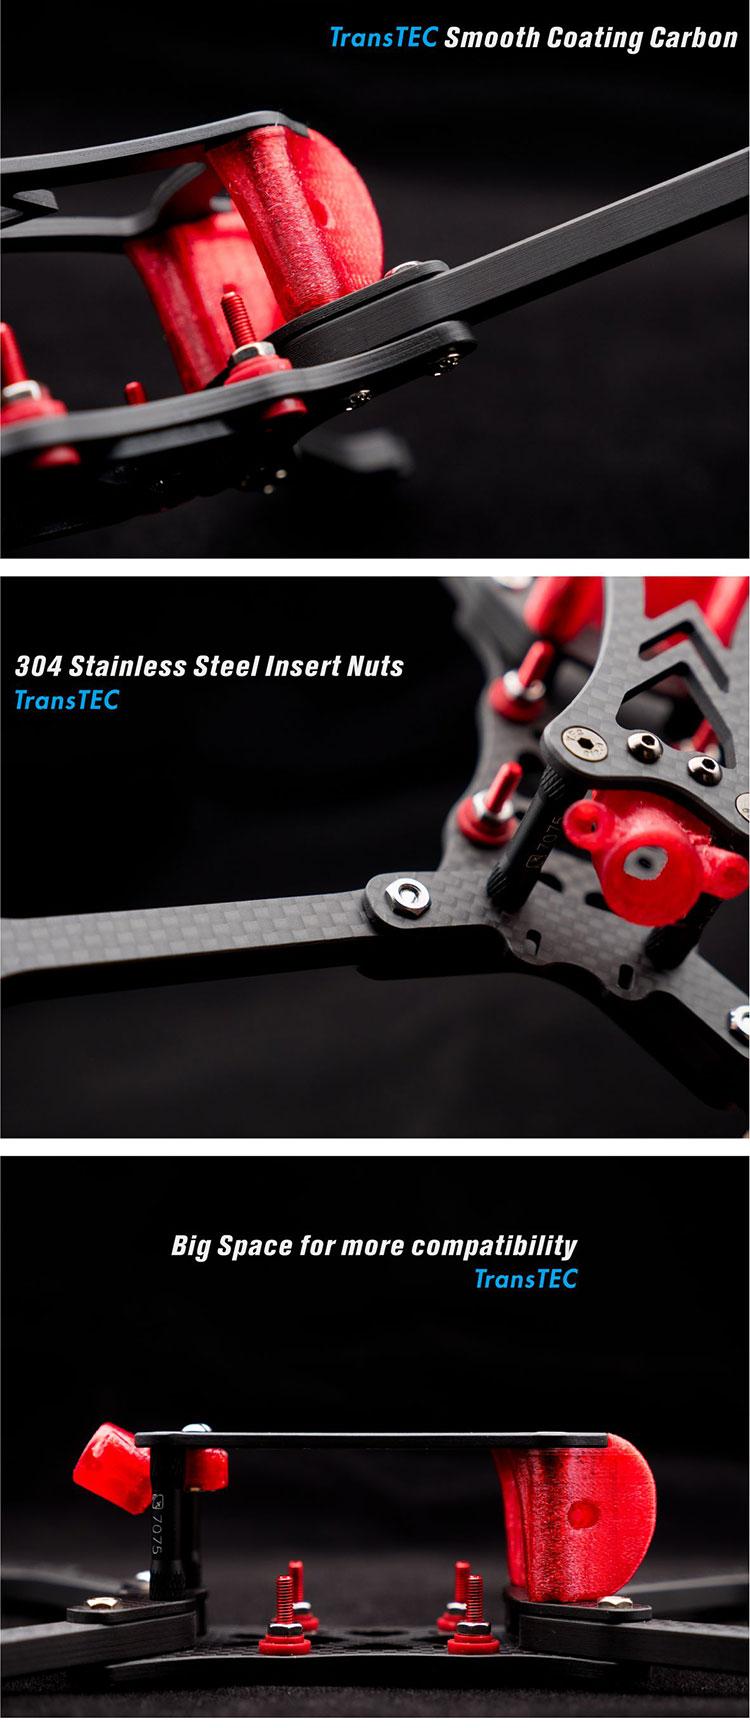 TRANSTEC LASER S 224 мм FPV Quadcopter Frame 6 мм Arm 7075 гладкий Чехол рамка из углеродного волокна для DALRC 55A 4 в 1 esc 5 дюймов реквизит